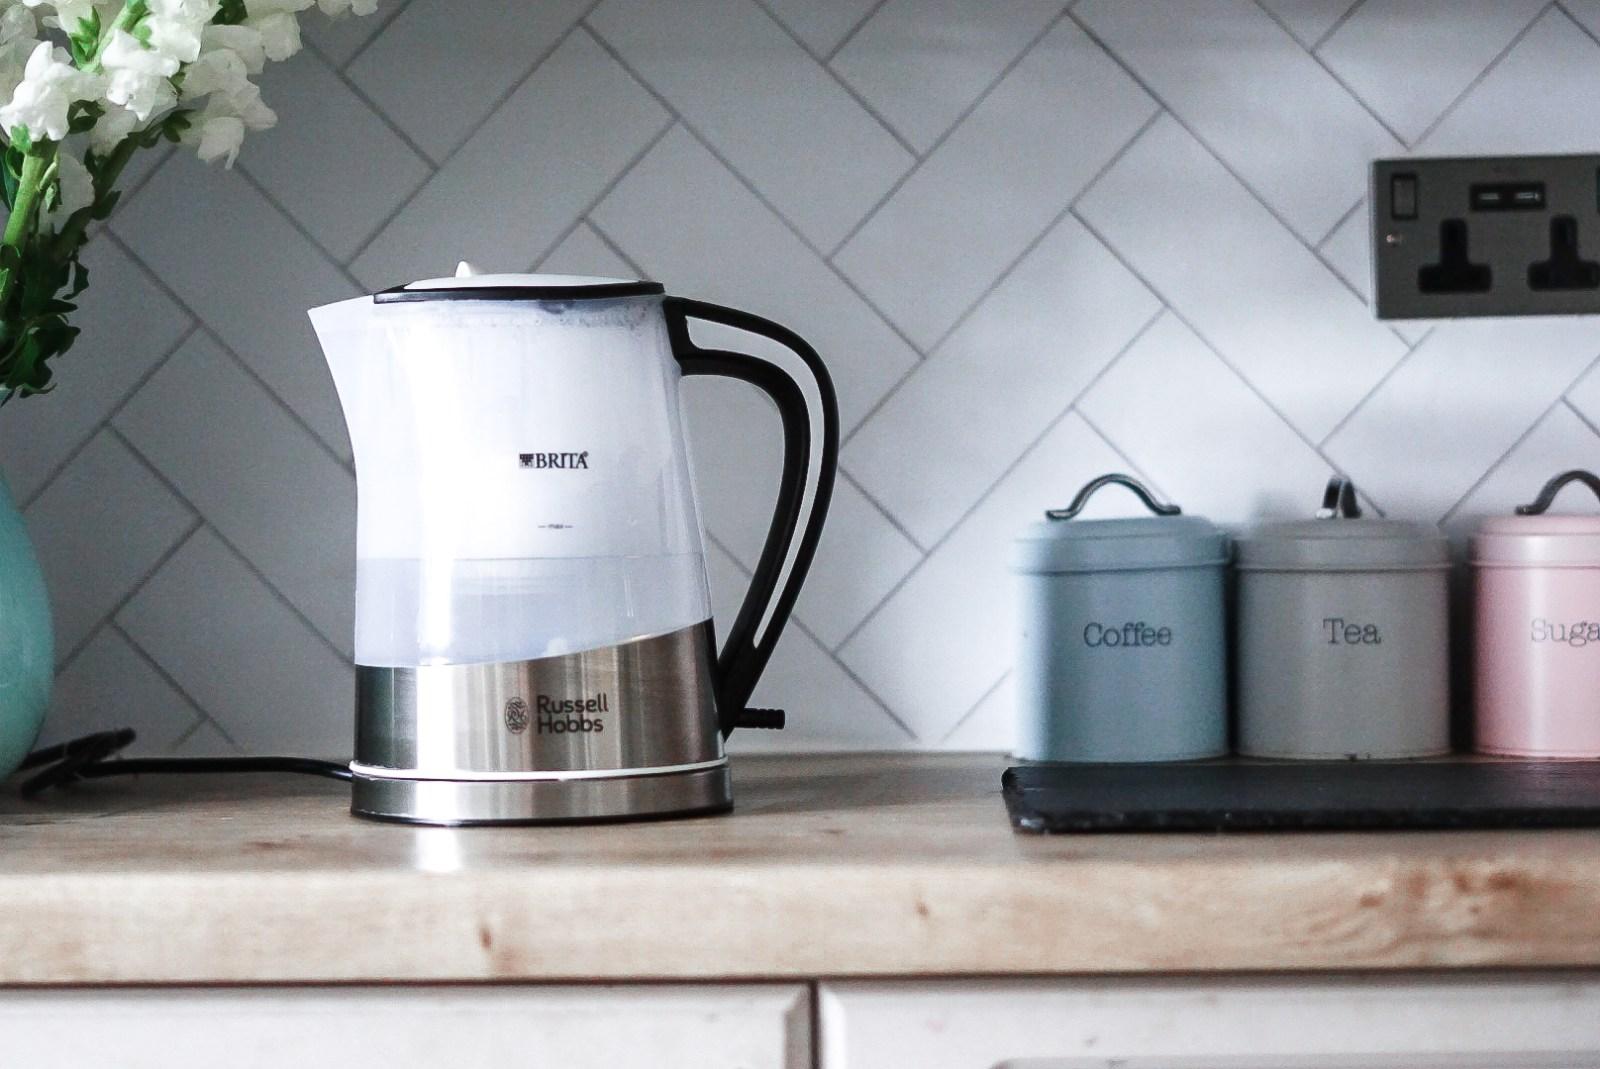 BRITA filter Purity glass kettle